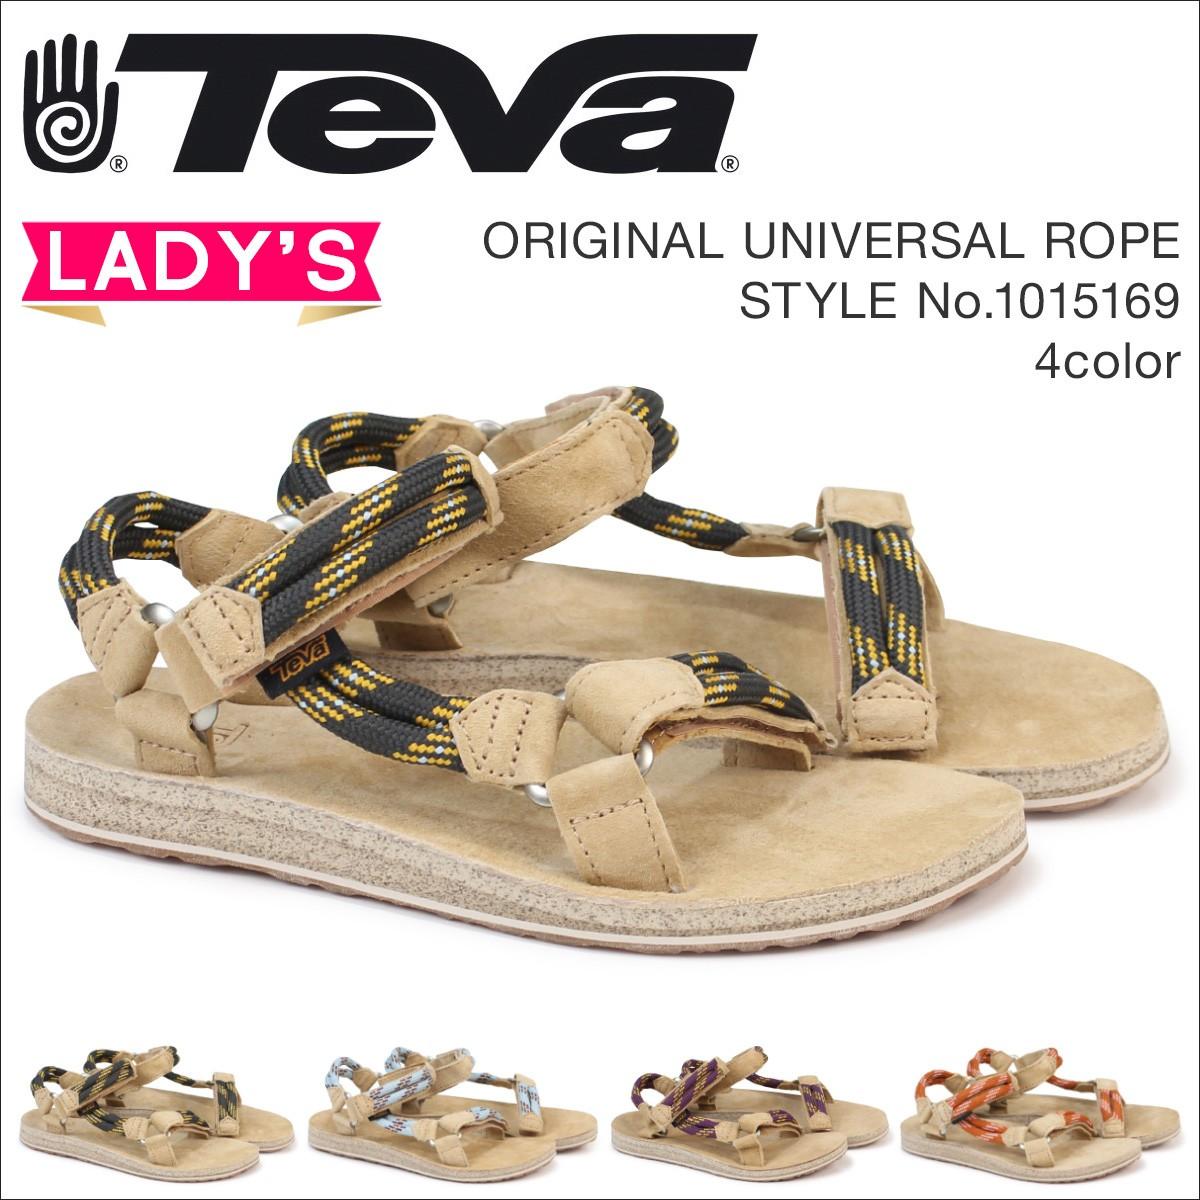 Teva テバ サンダル レディース オリジナル ユニバーサル ロープ ORIGINAL UNIVERSAL ROPE WOMEN 1015169 [3/14 新入荷]